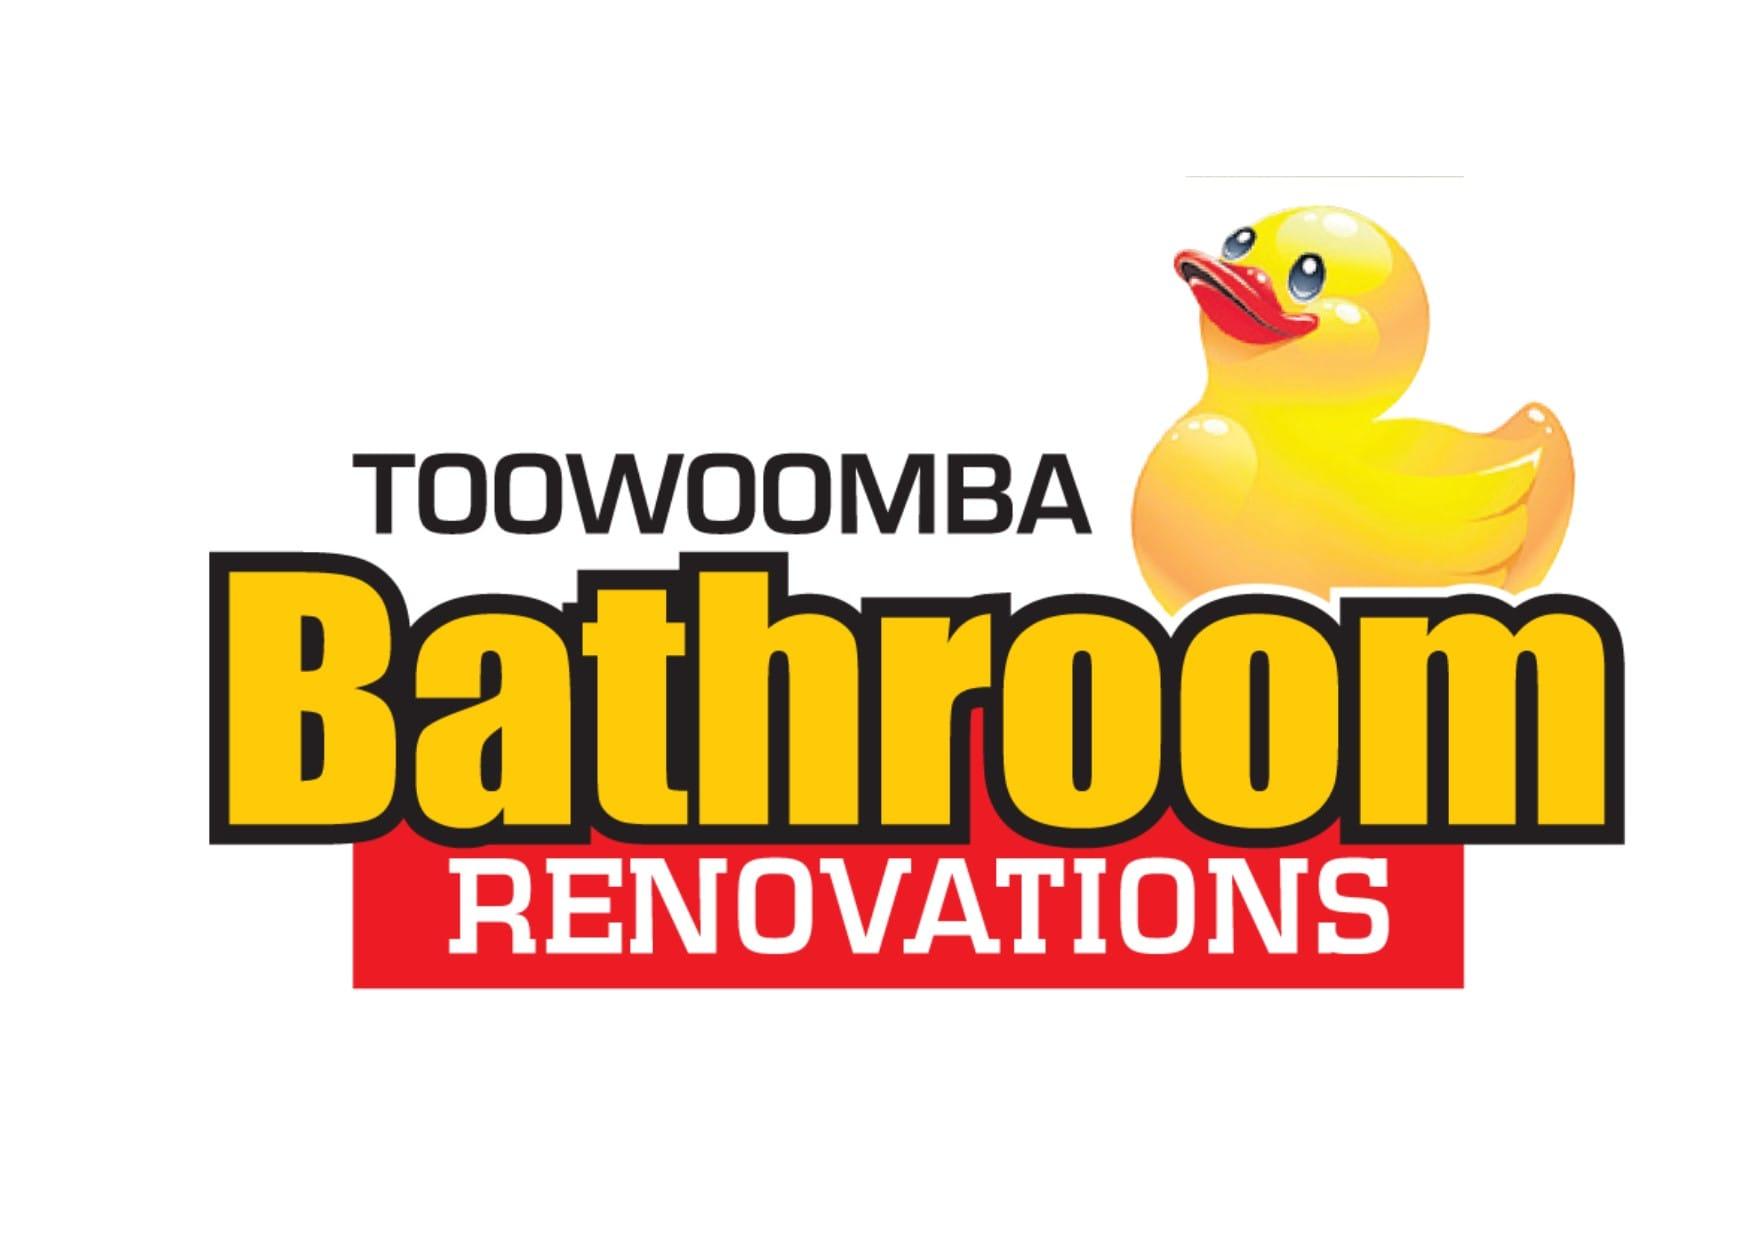 Bathroom Designs Qld bathroom renovations & designs in toowoomba region, qld